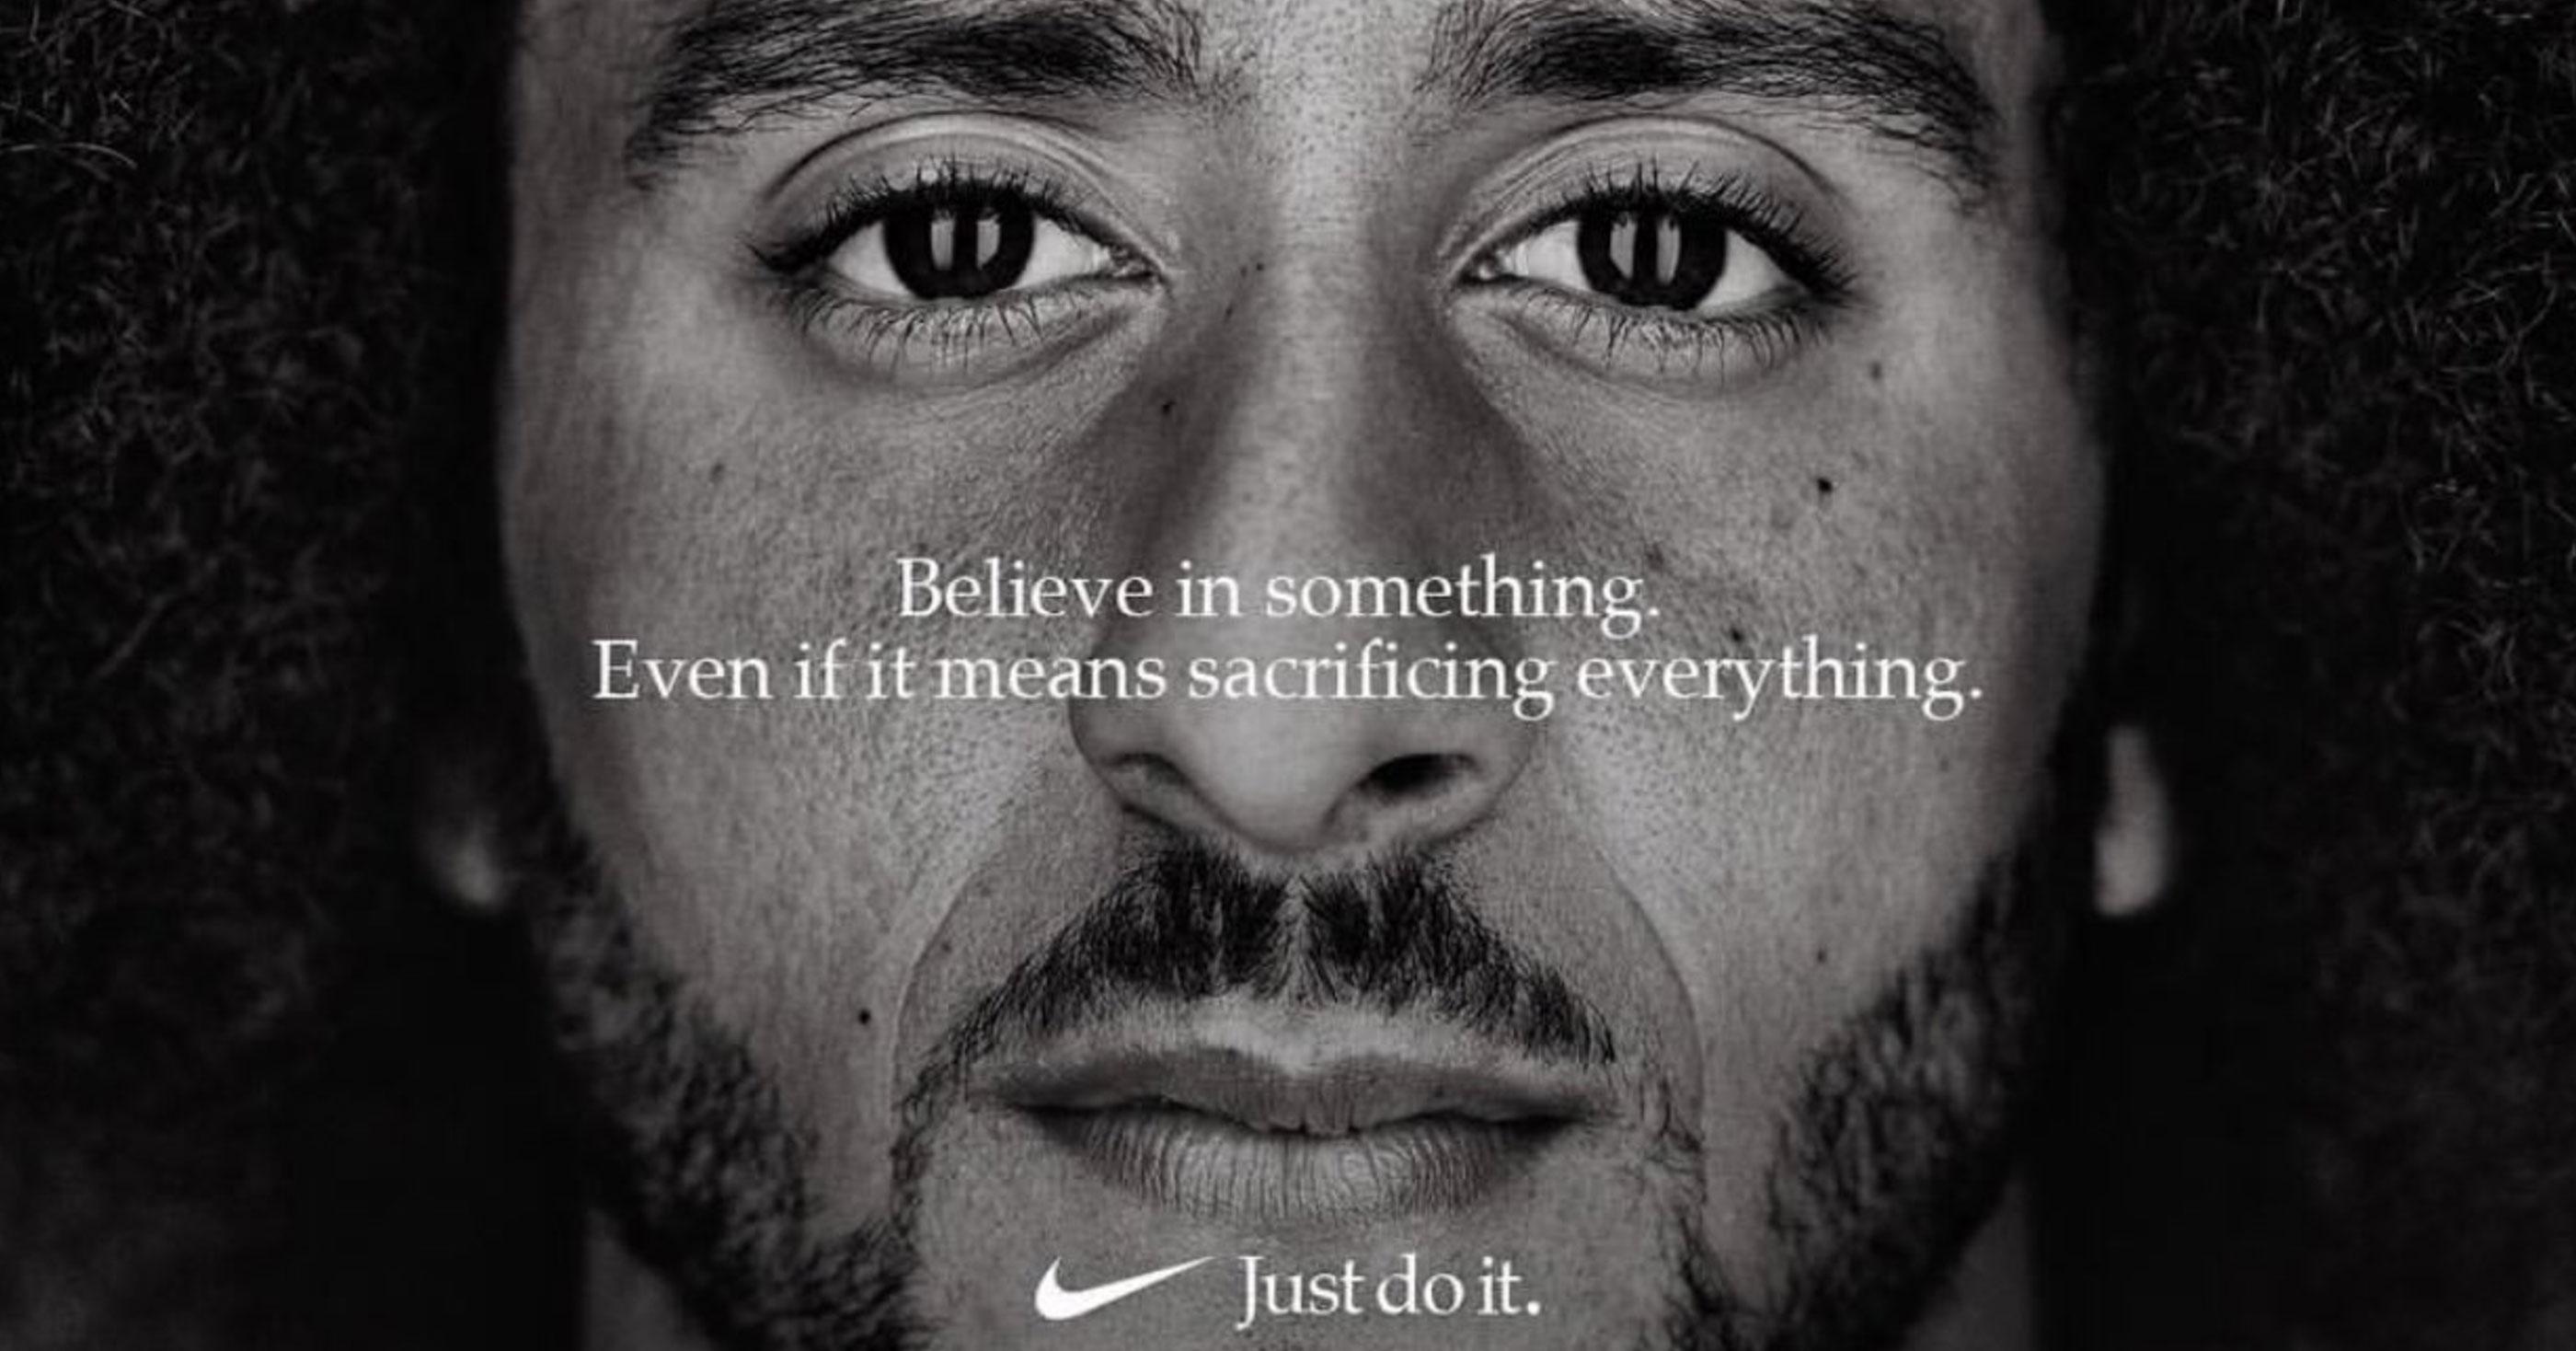 eab36a7c1ccafa Here Are All The Best Spoof Colin Kaepernick Nike Advertisements (PICS)